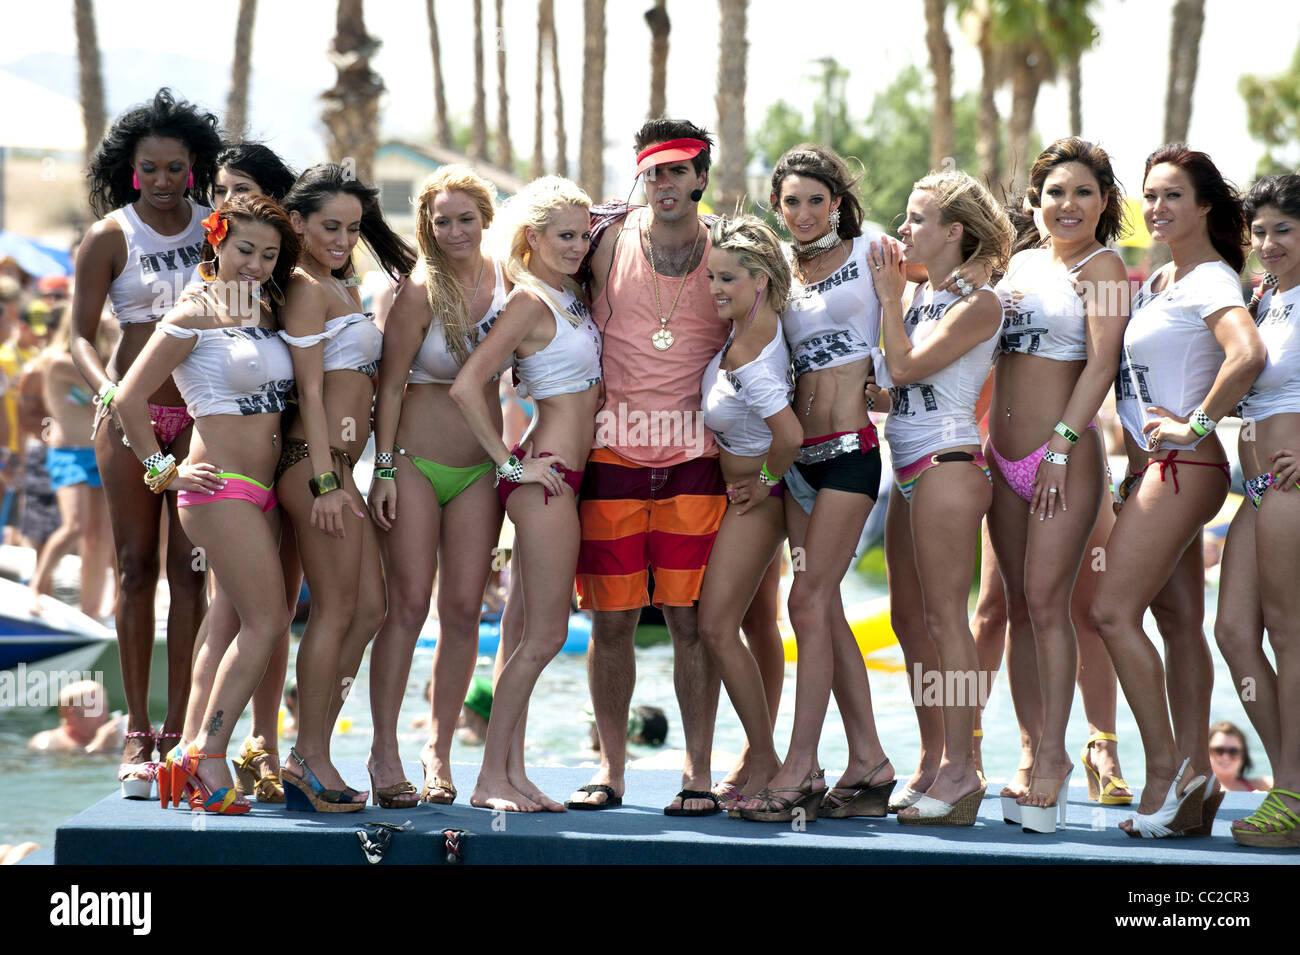 Bikini contest wet tee shirt